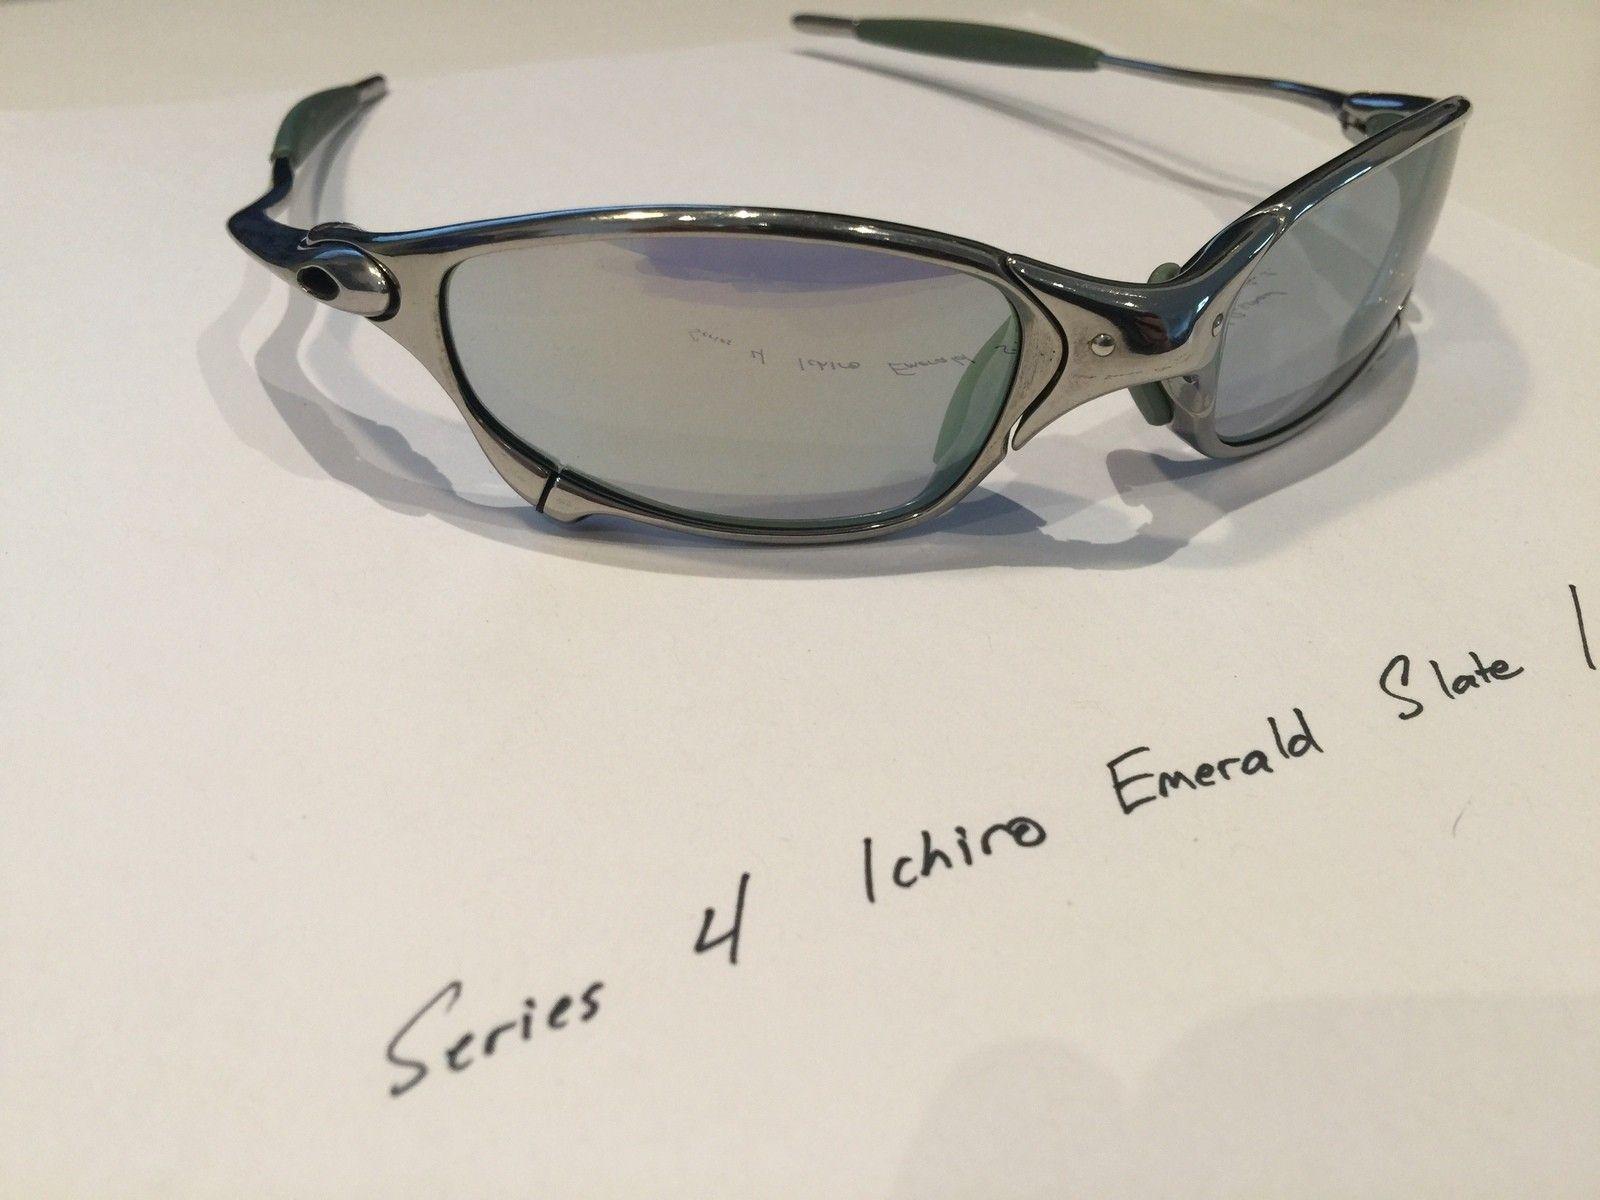 Ichiro Emerald Slate / Polished Frame Juliets (with box) - IMG_3815.JPG